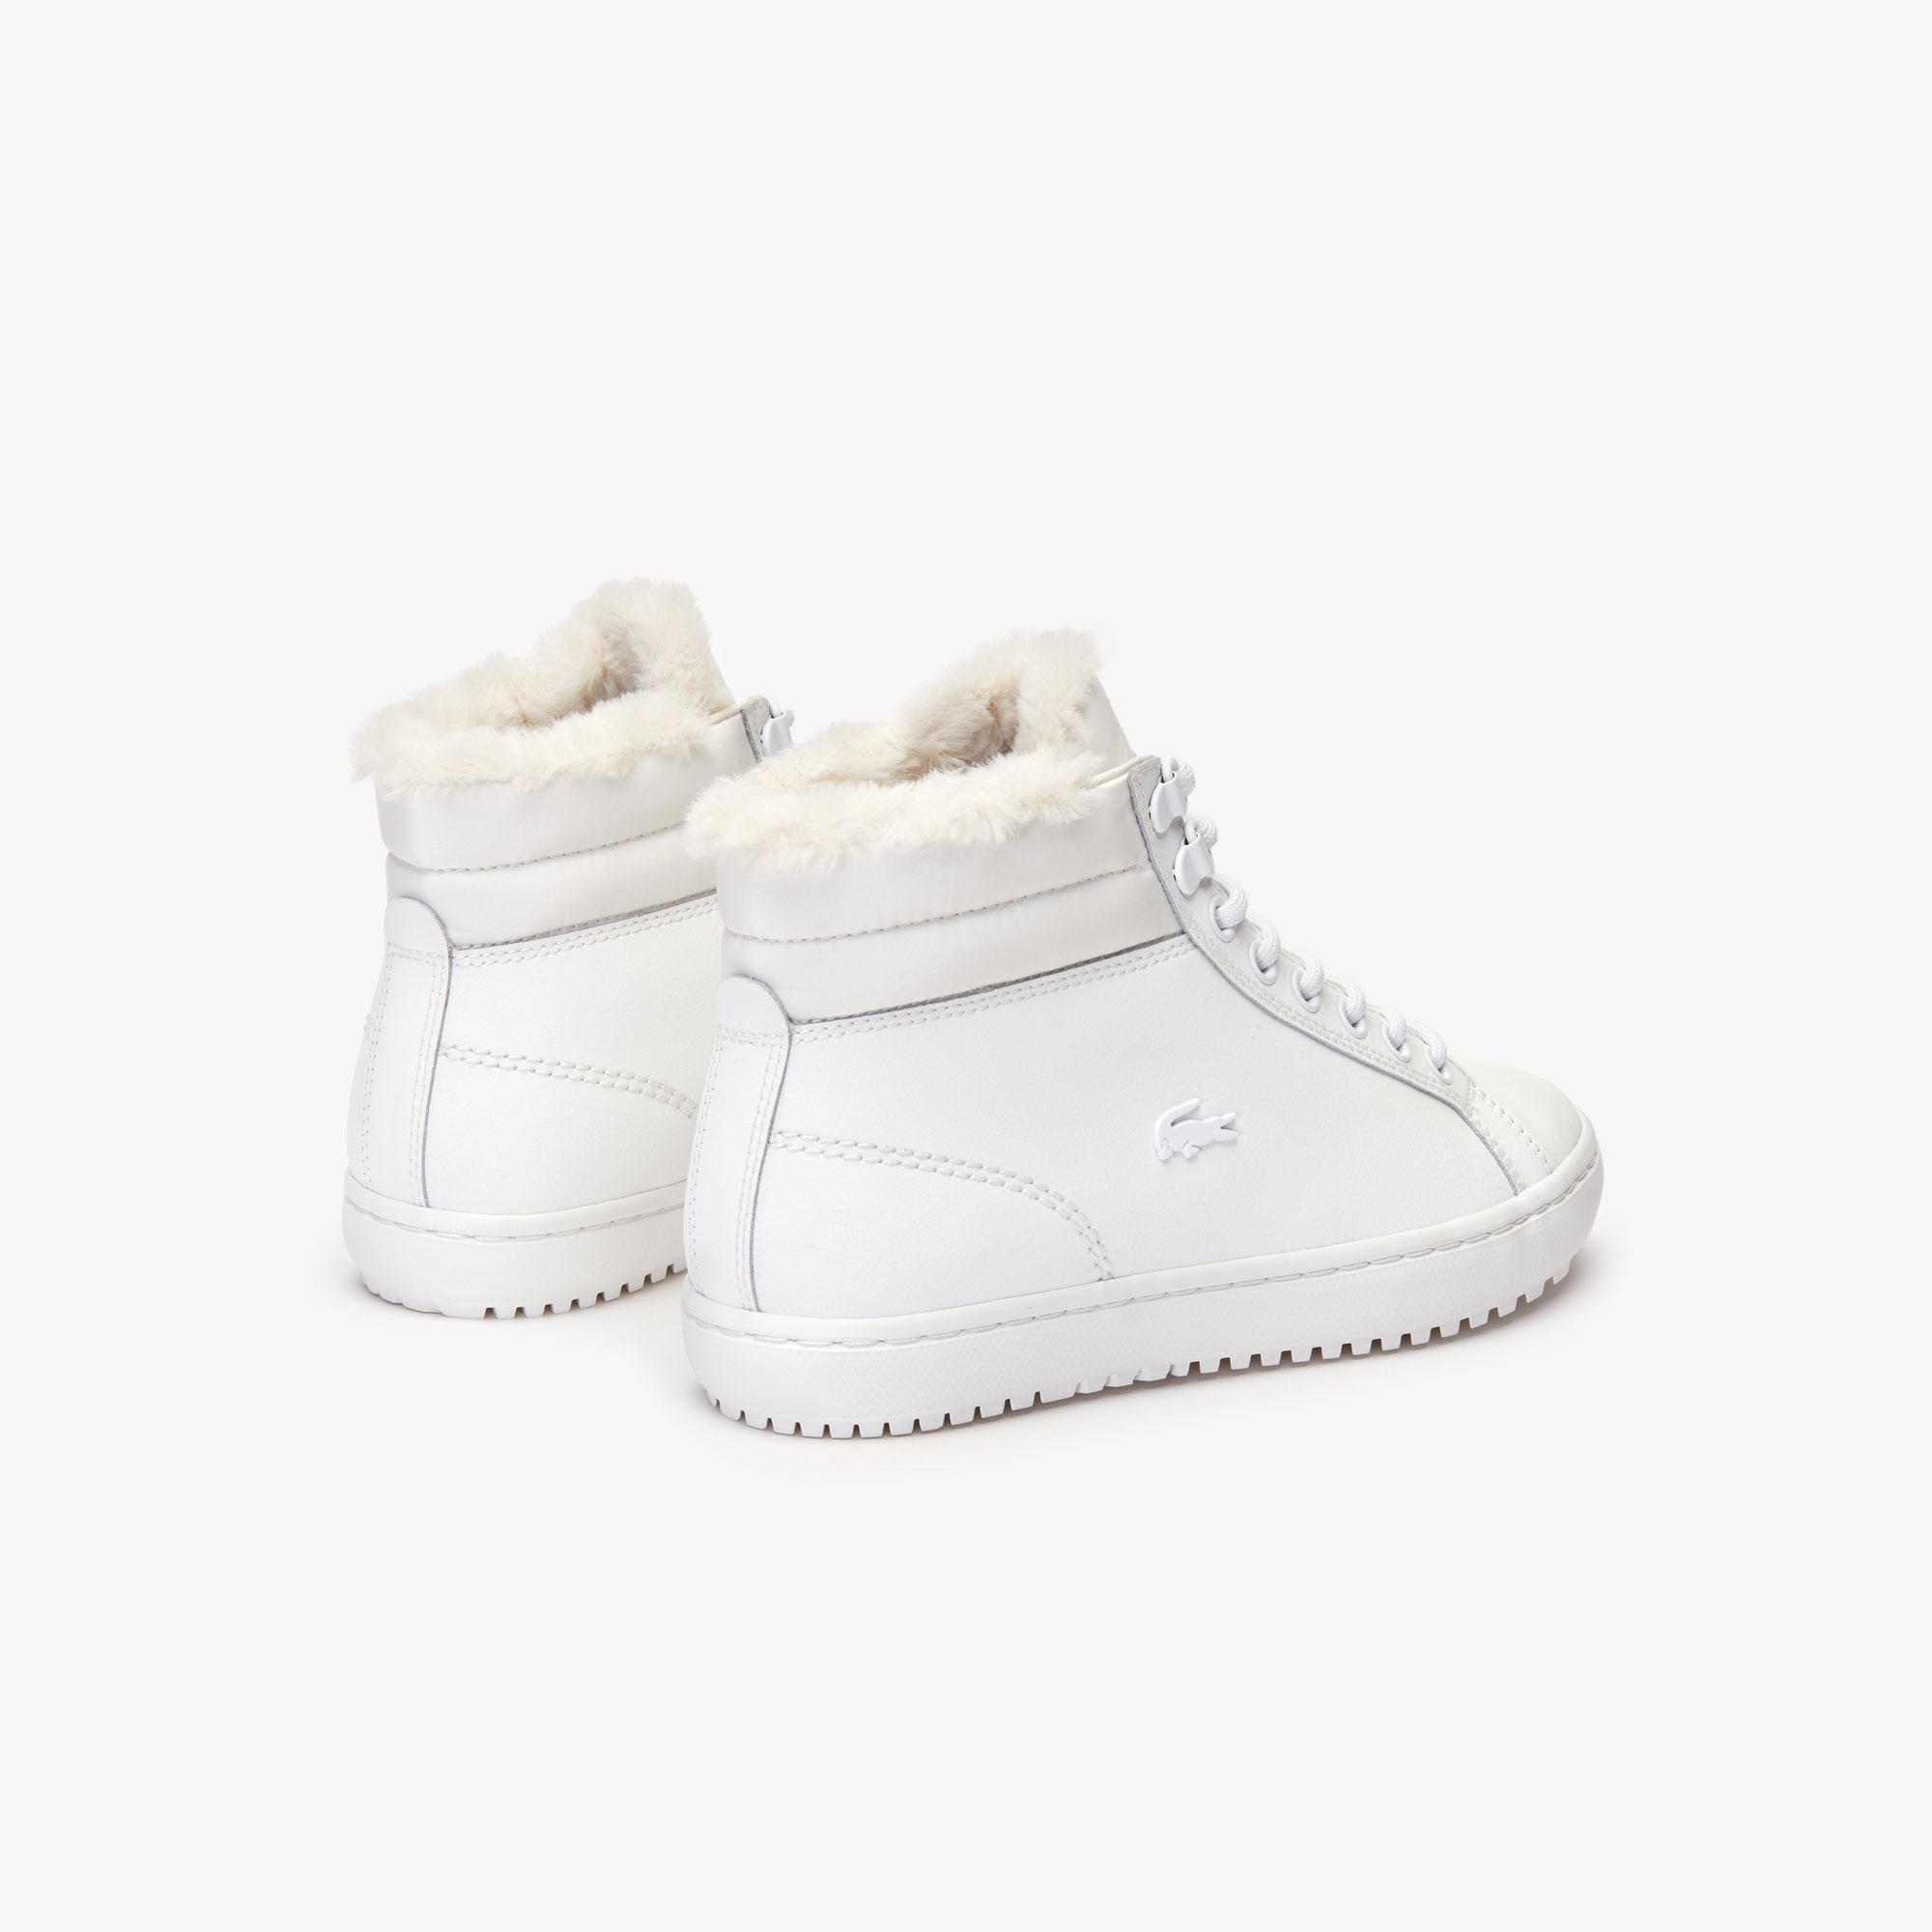 Lacoste черевики жіночі Straightset Thermo